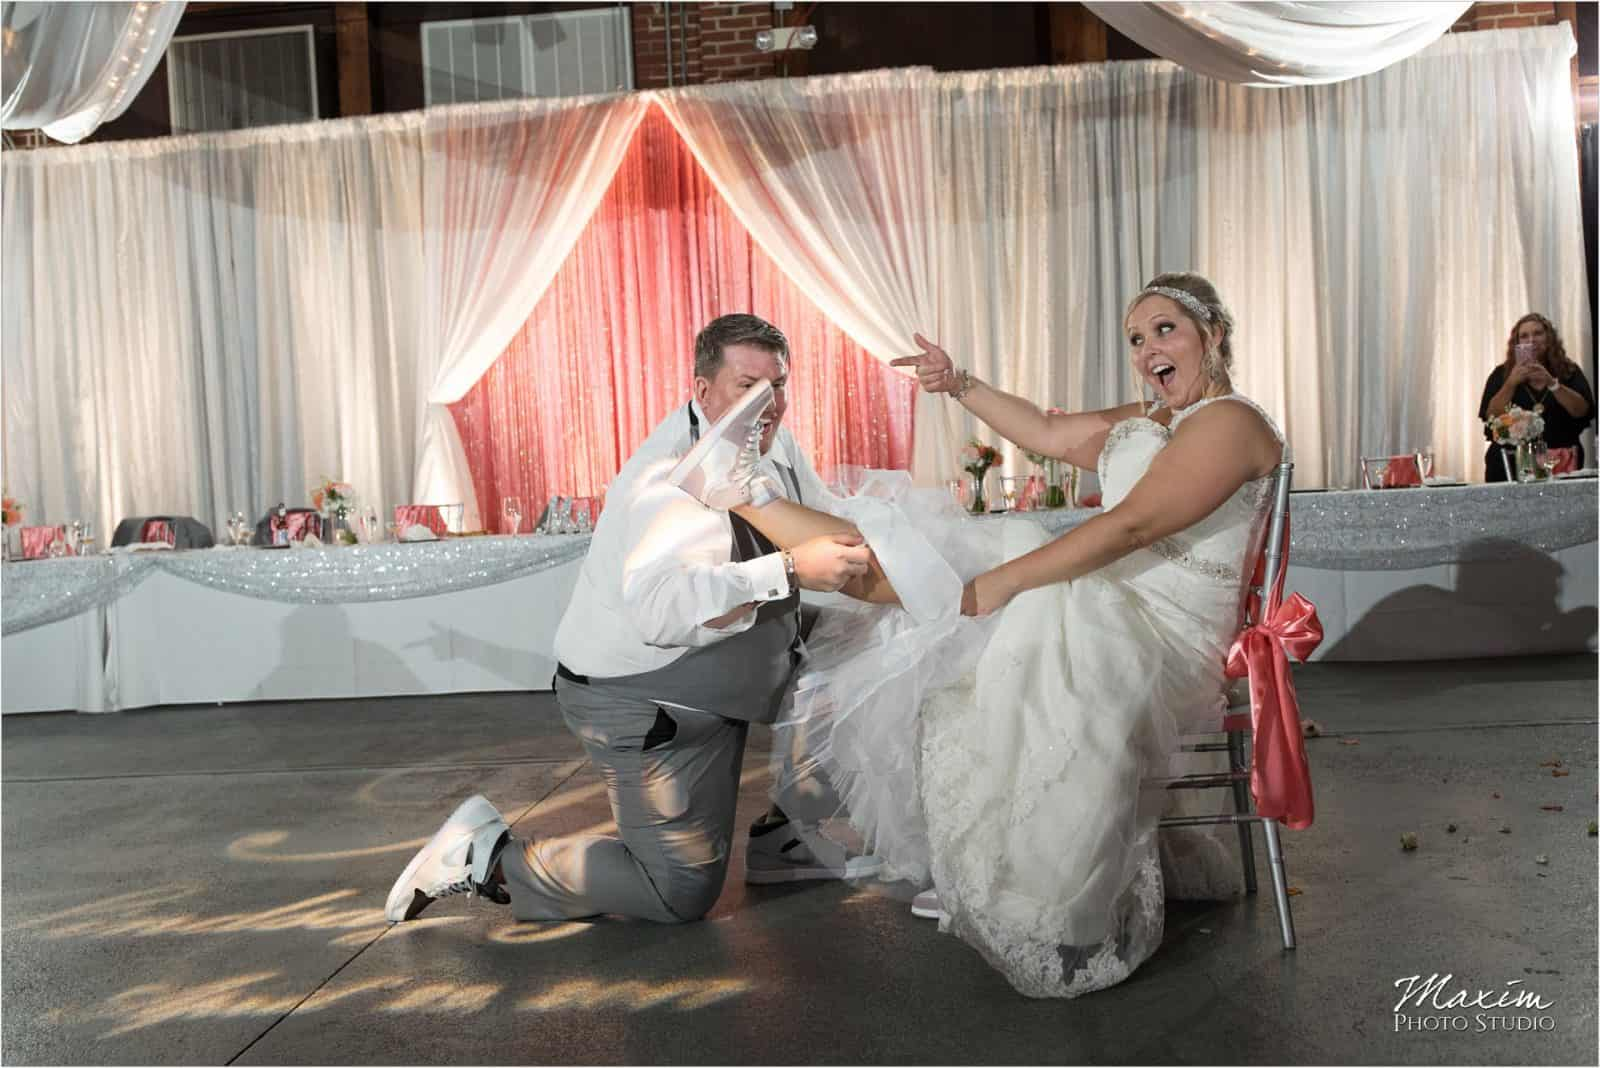 Top of the Market Dayton Ohio Wedding Reception garter